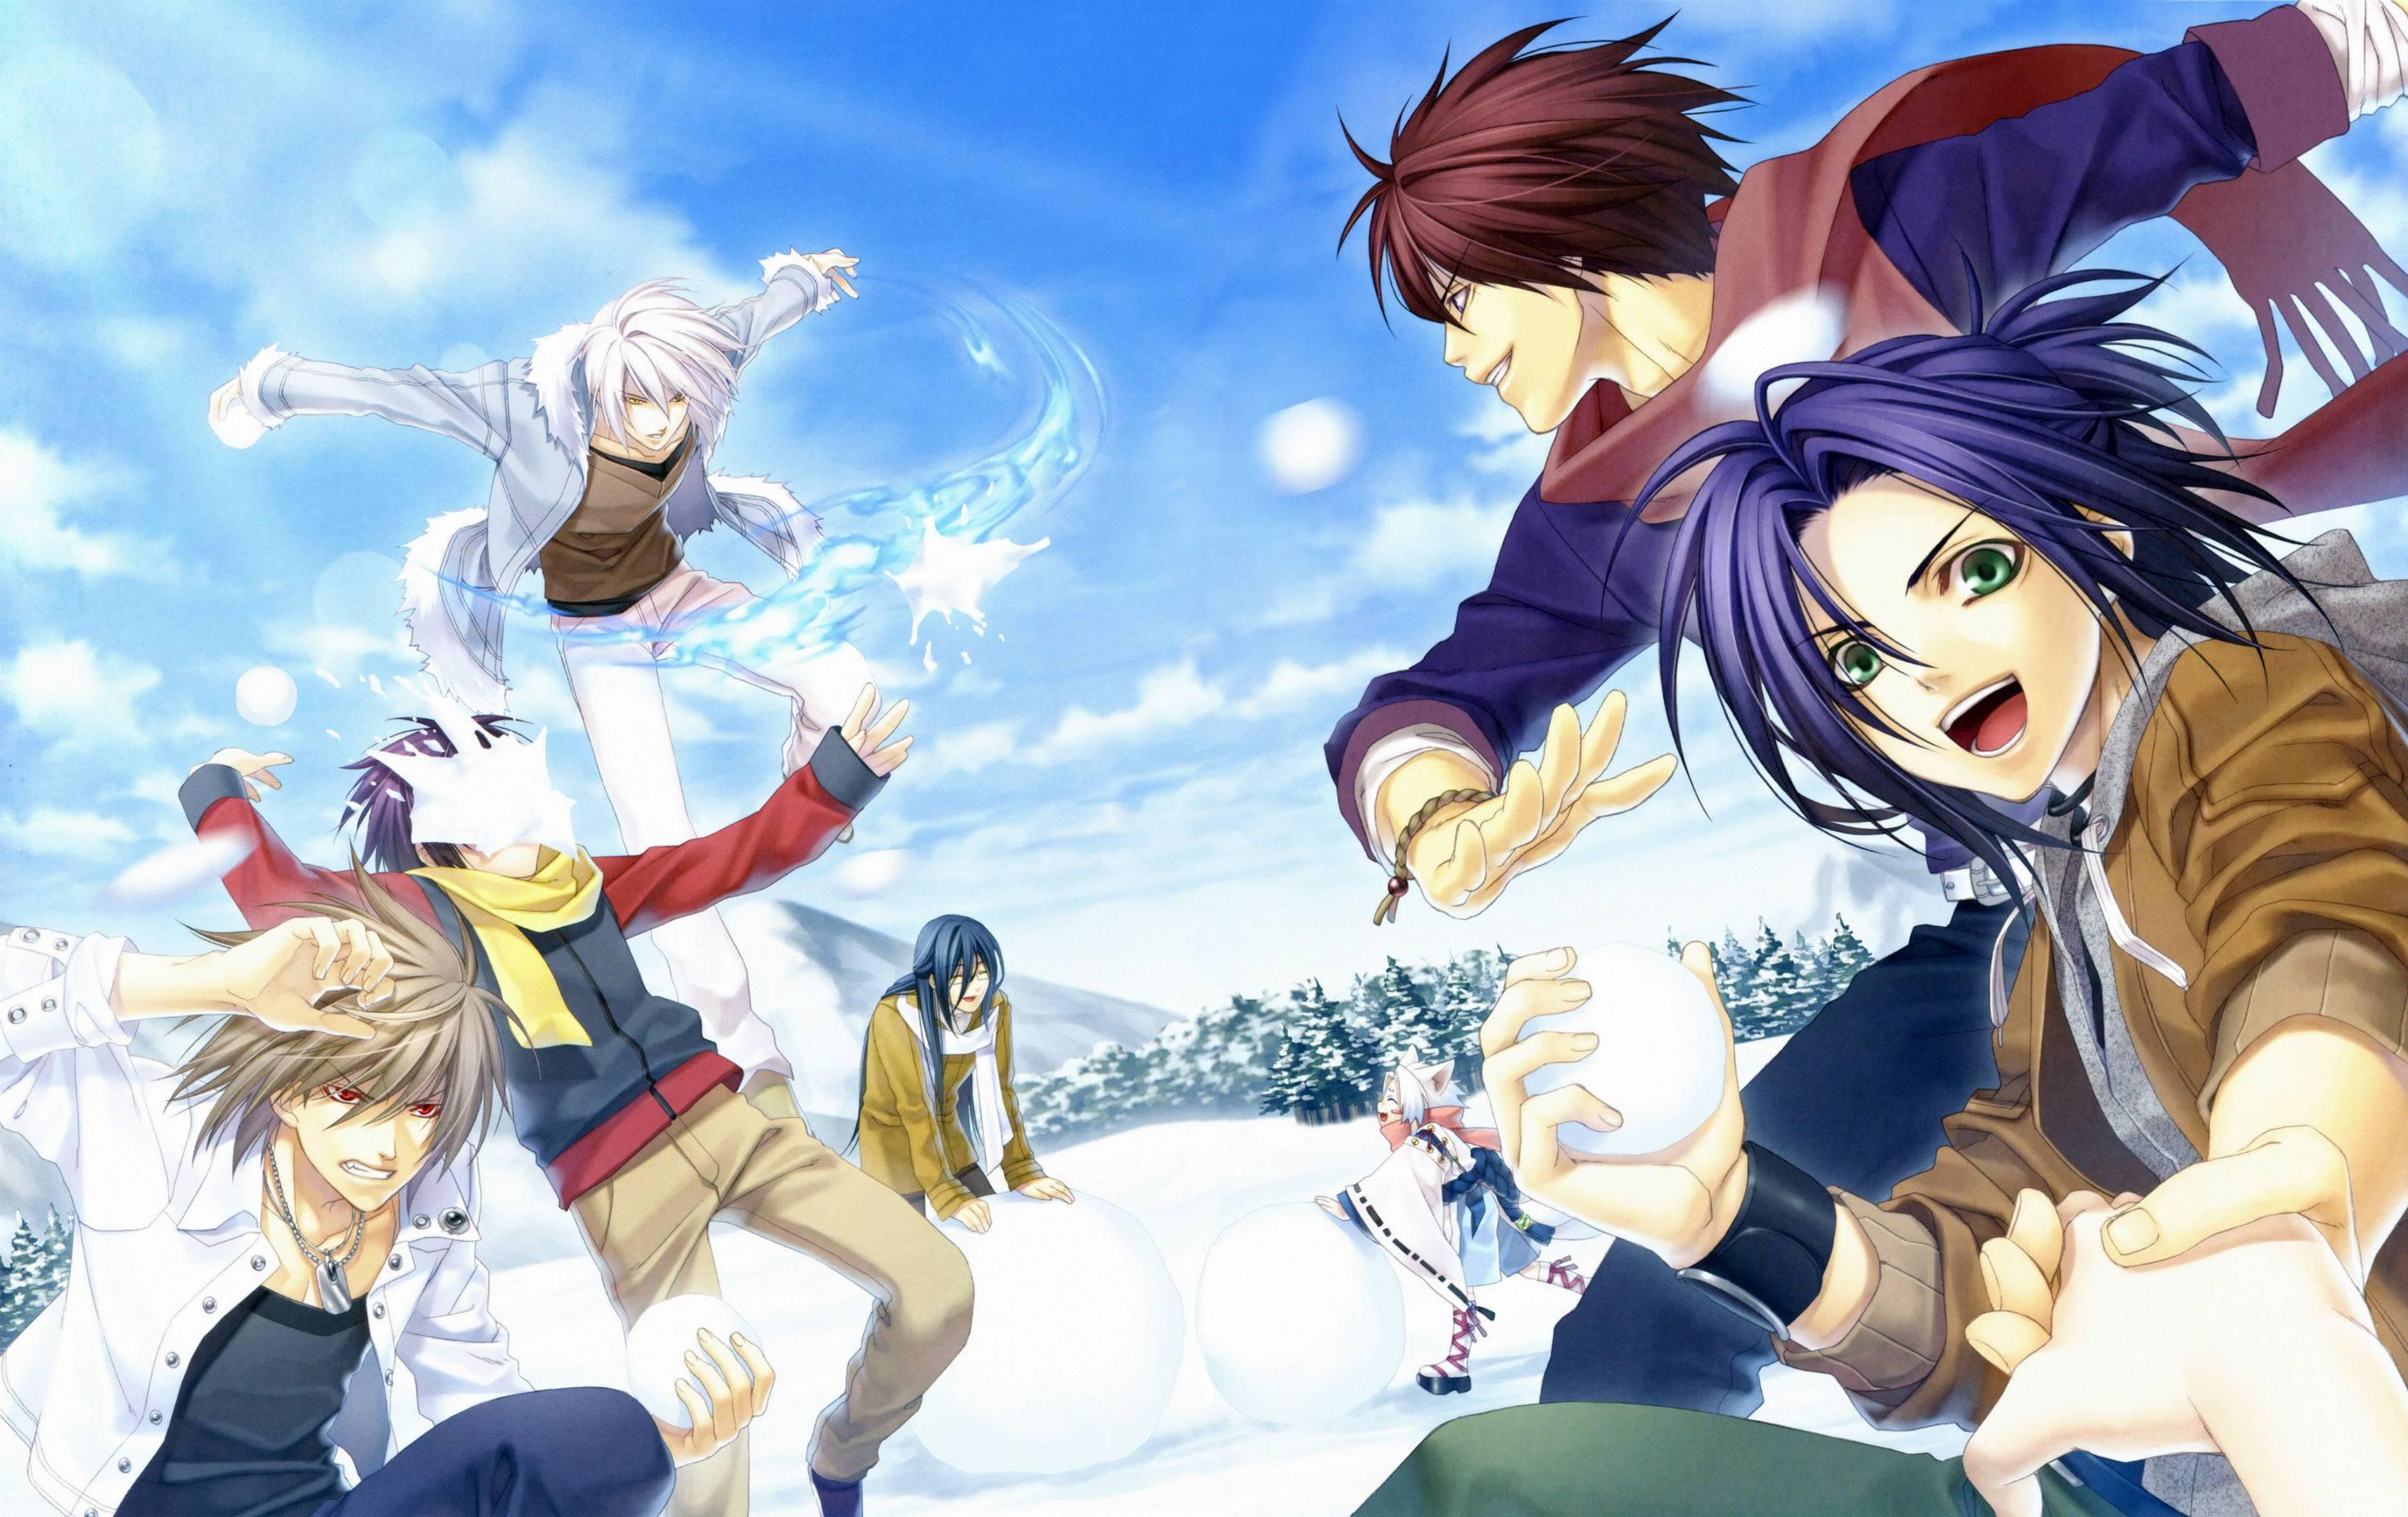 HD Quality Wallpaper | Collection: Anime, 2984x1880 Hiiro No Kakera